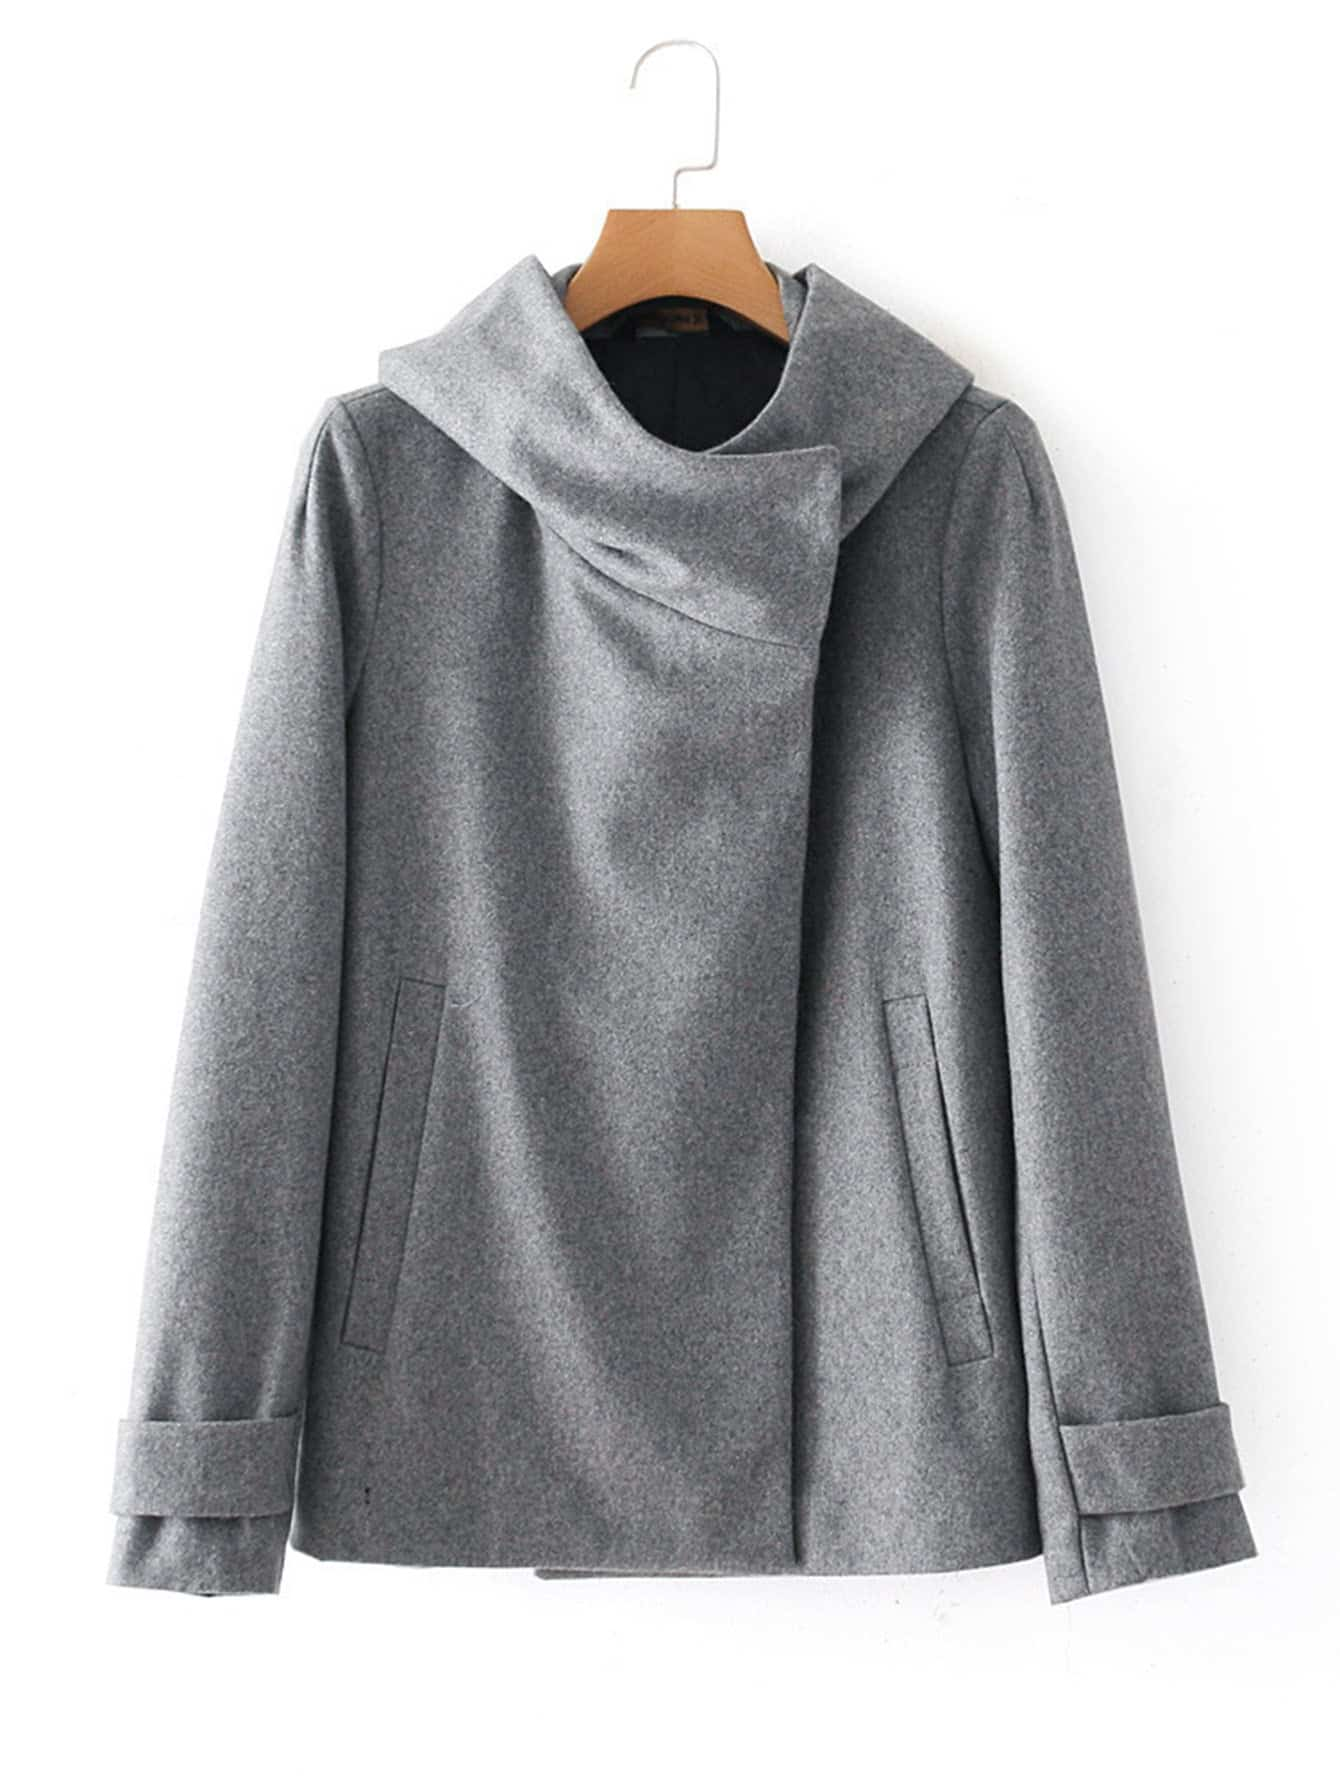 Image of Oversized Collar Wool Blend Coat